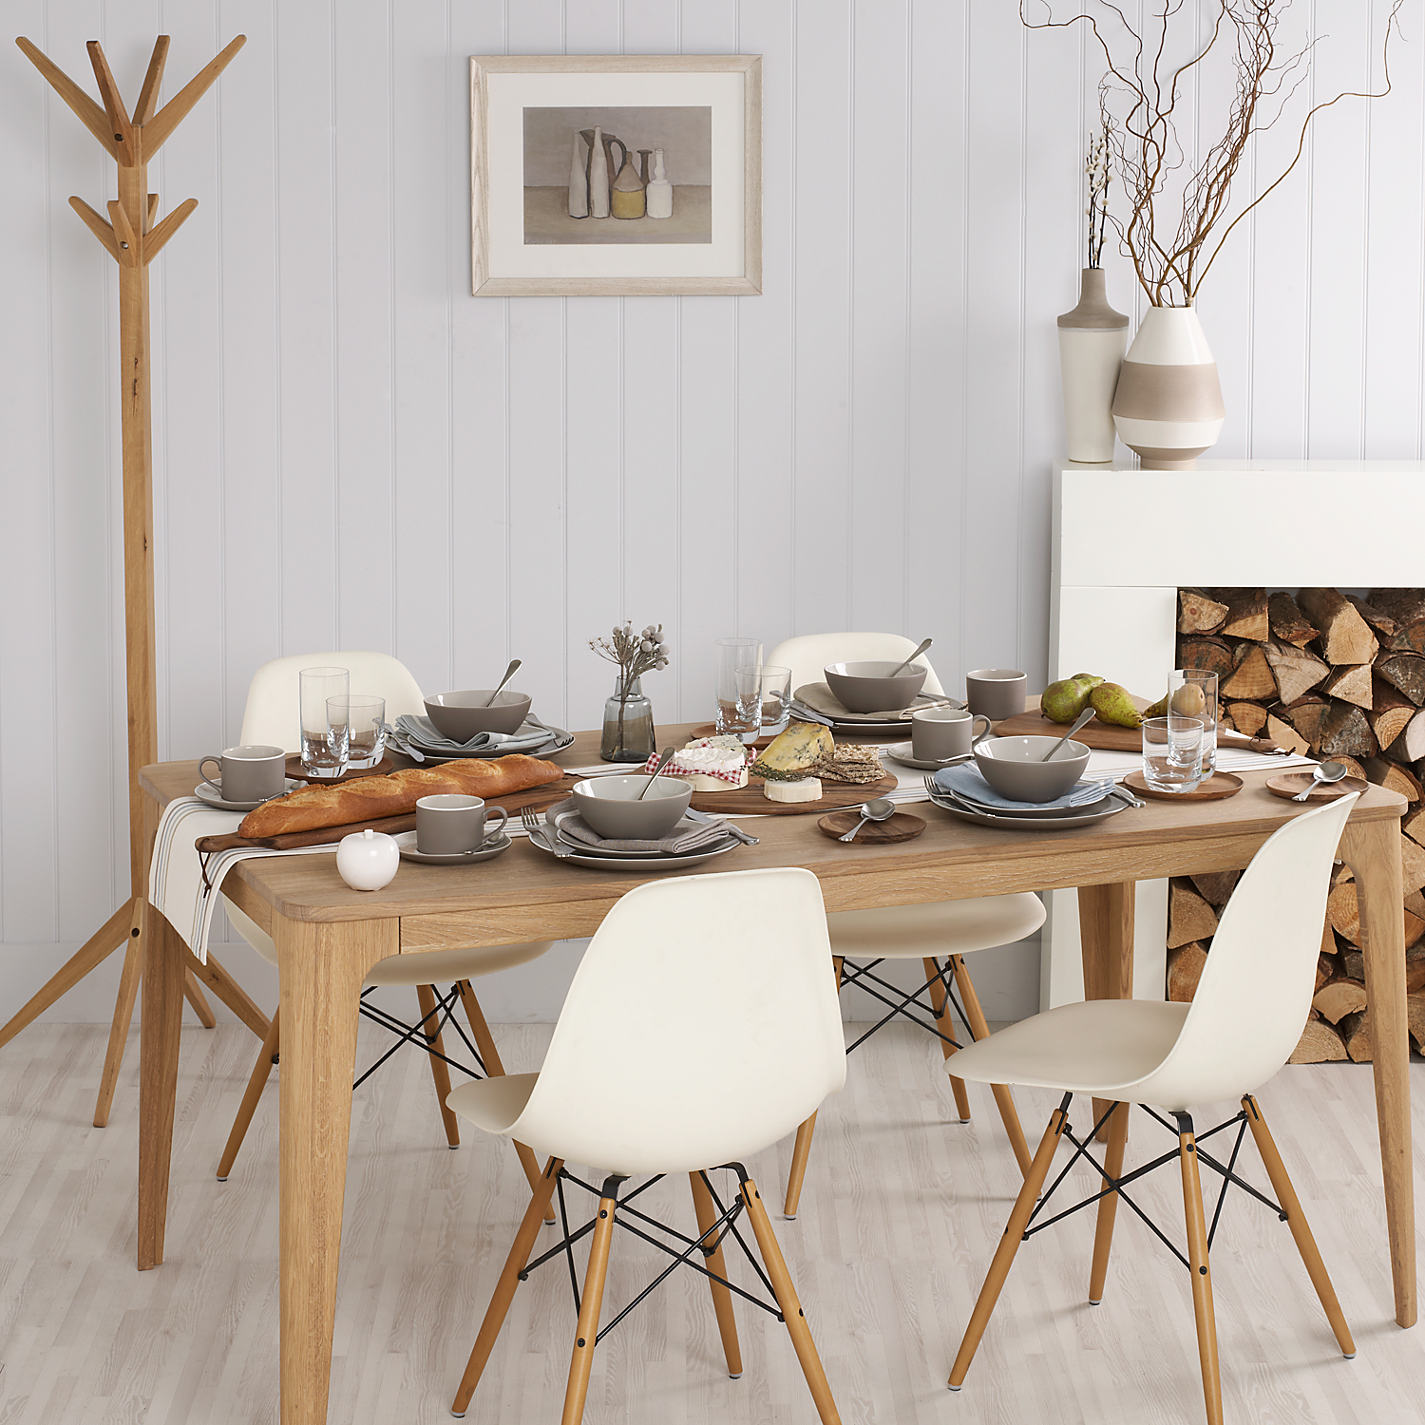 The Range Dining Room Furniture Buy Ebbe Gehl For John Lewis Mira Living Amp Dining Room Furniture